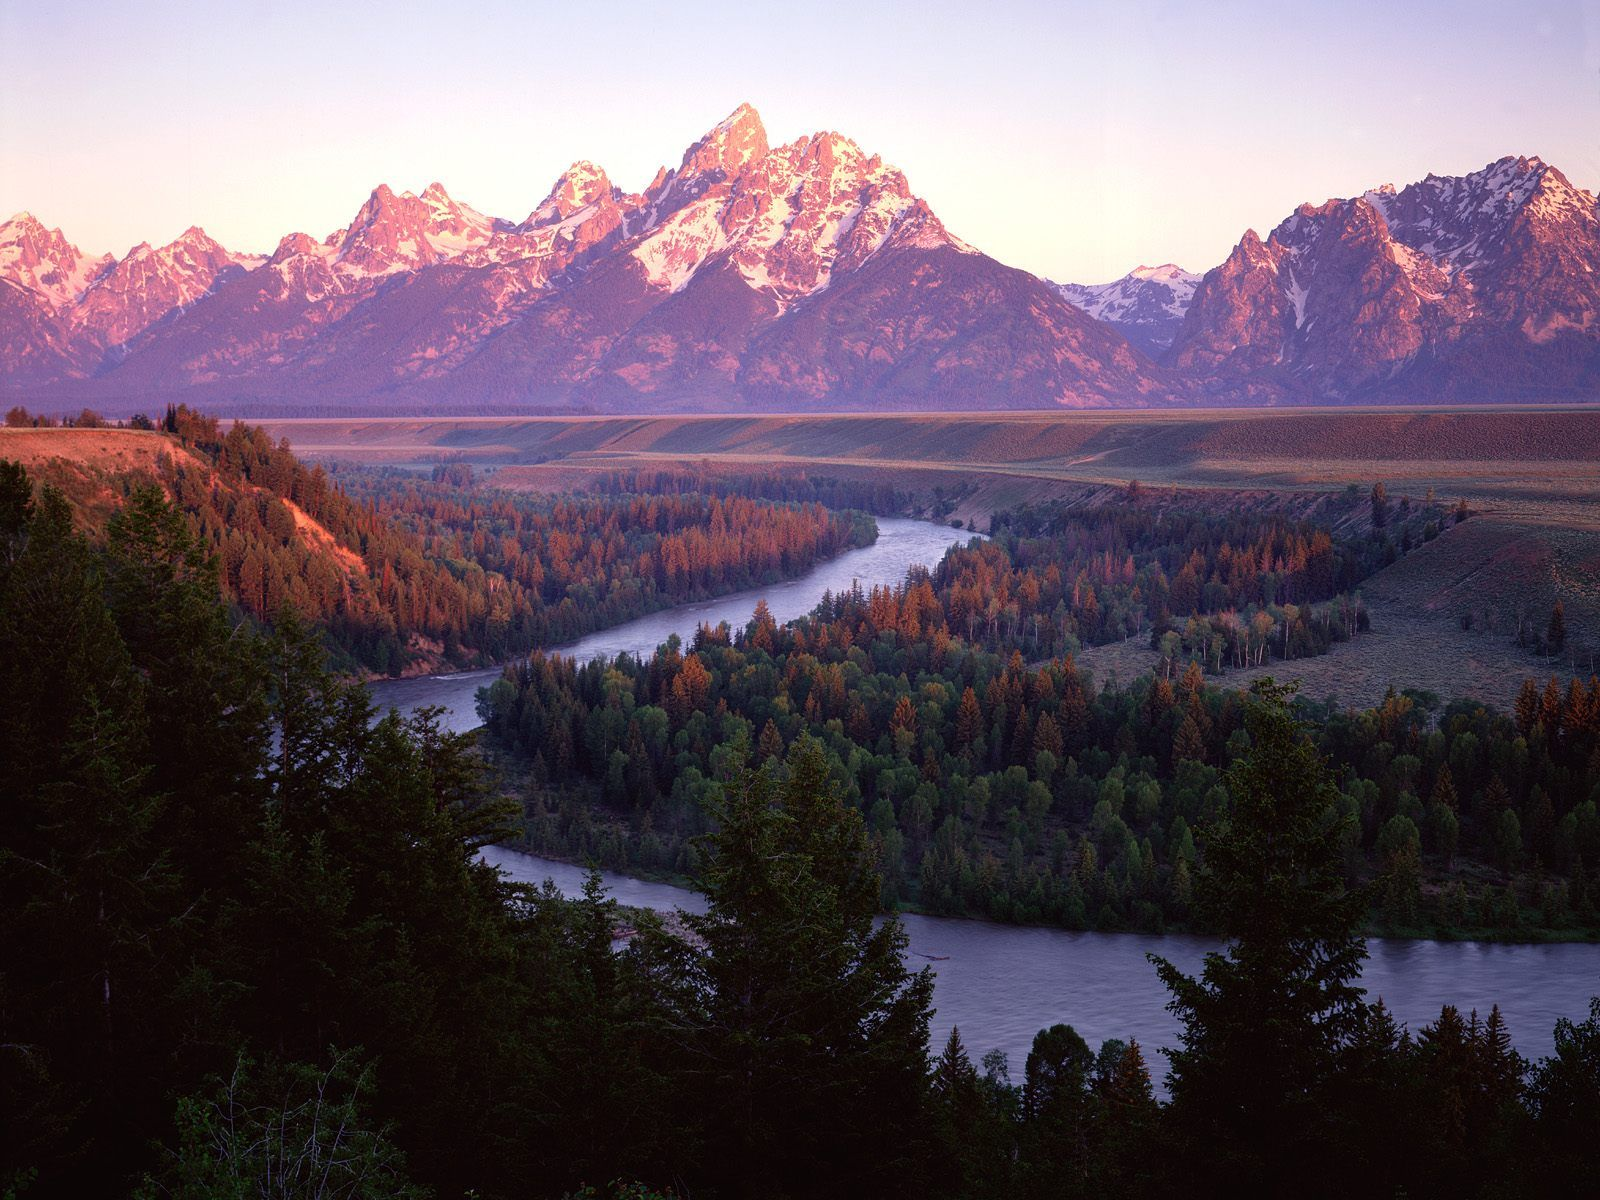 Grand Teton Range And The Snake River In Wyoming  I Hve